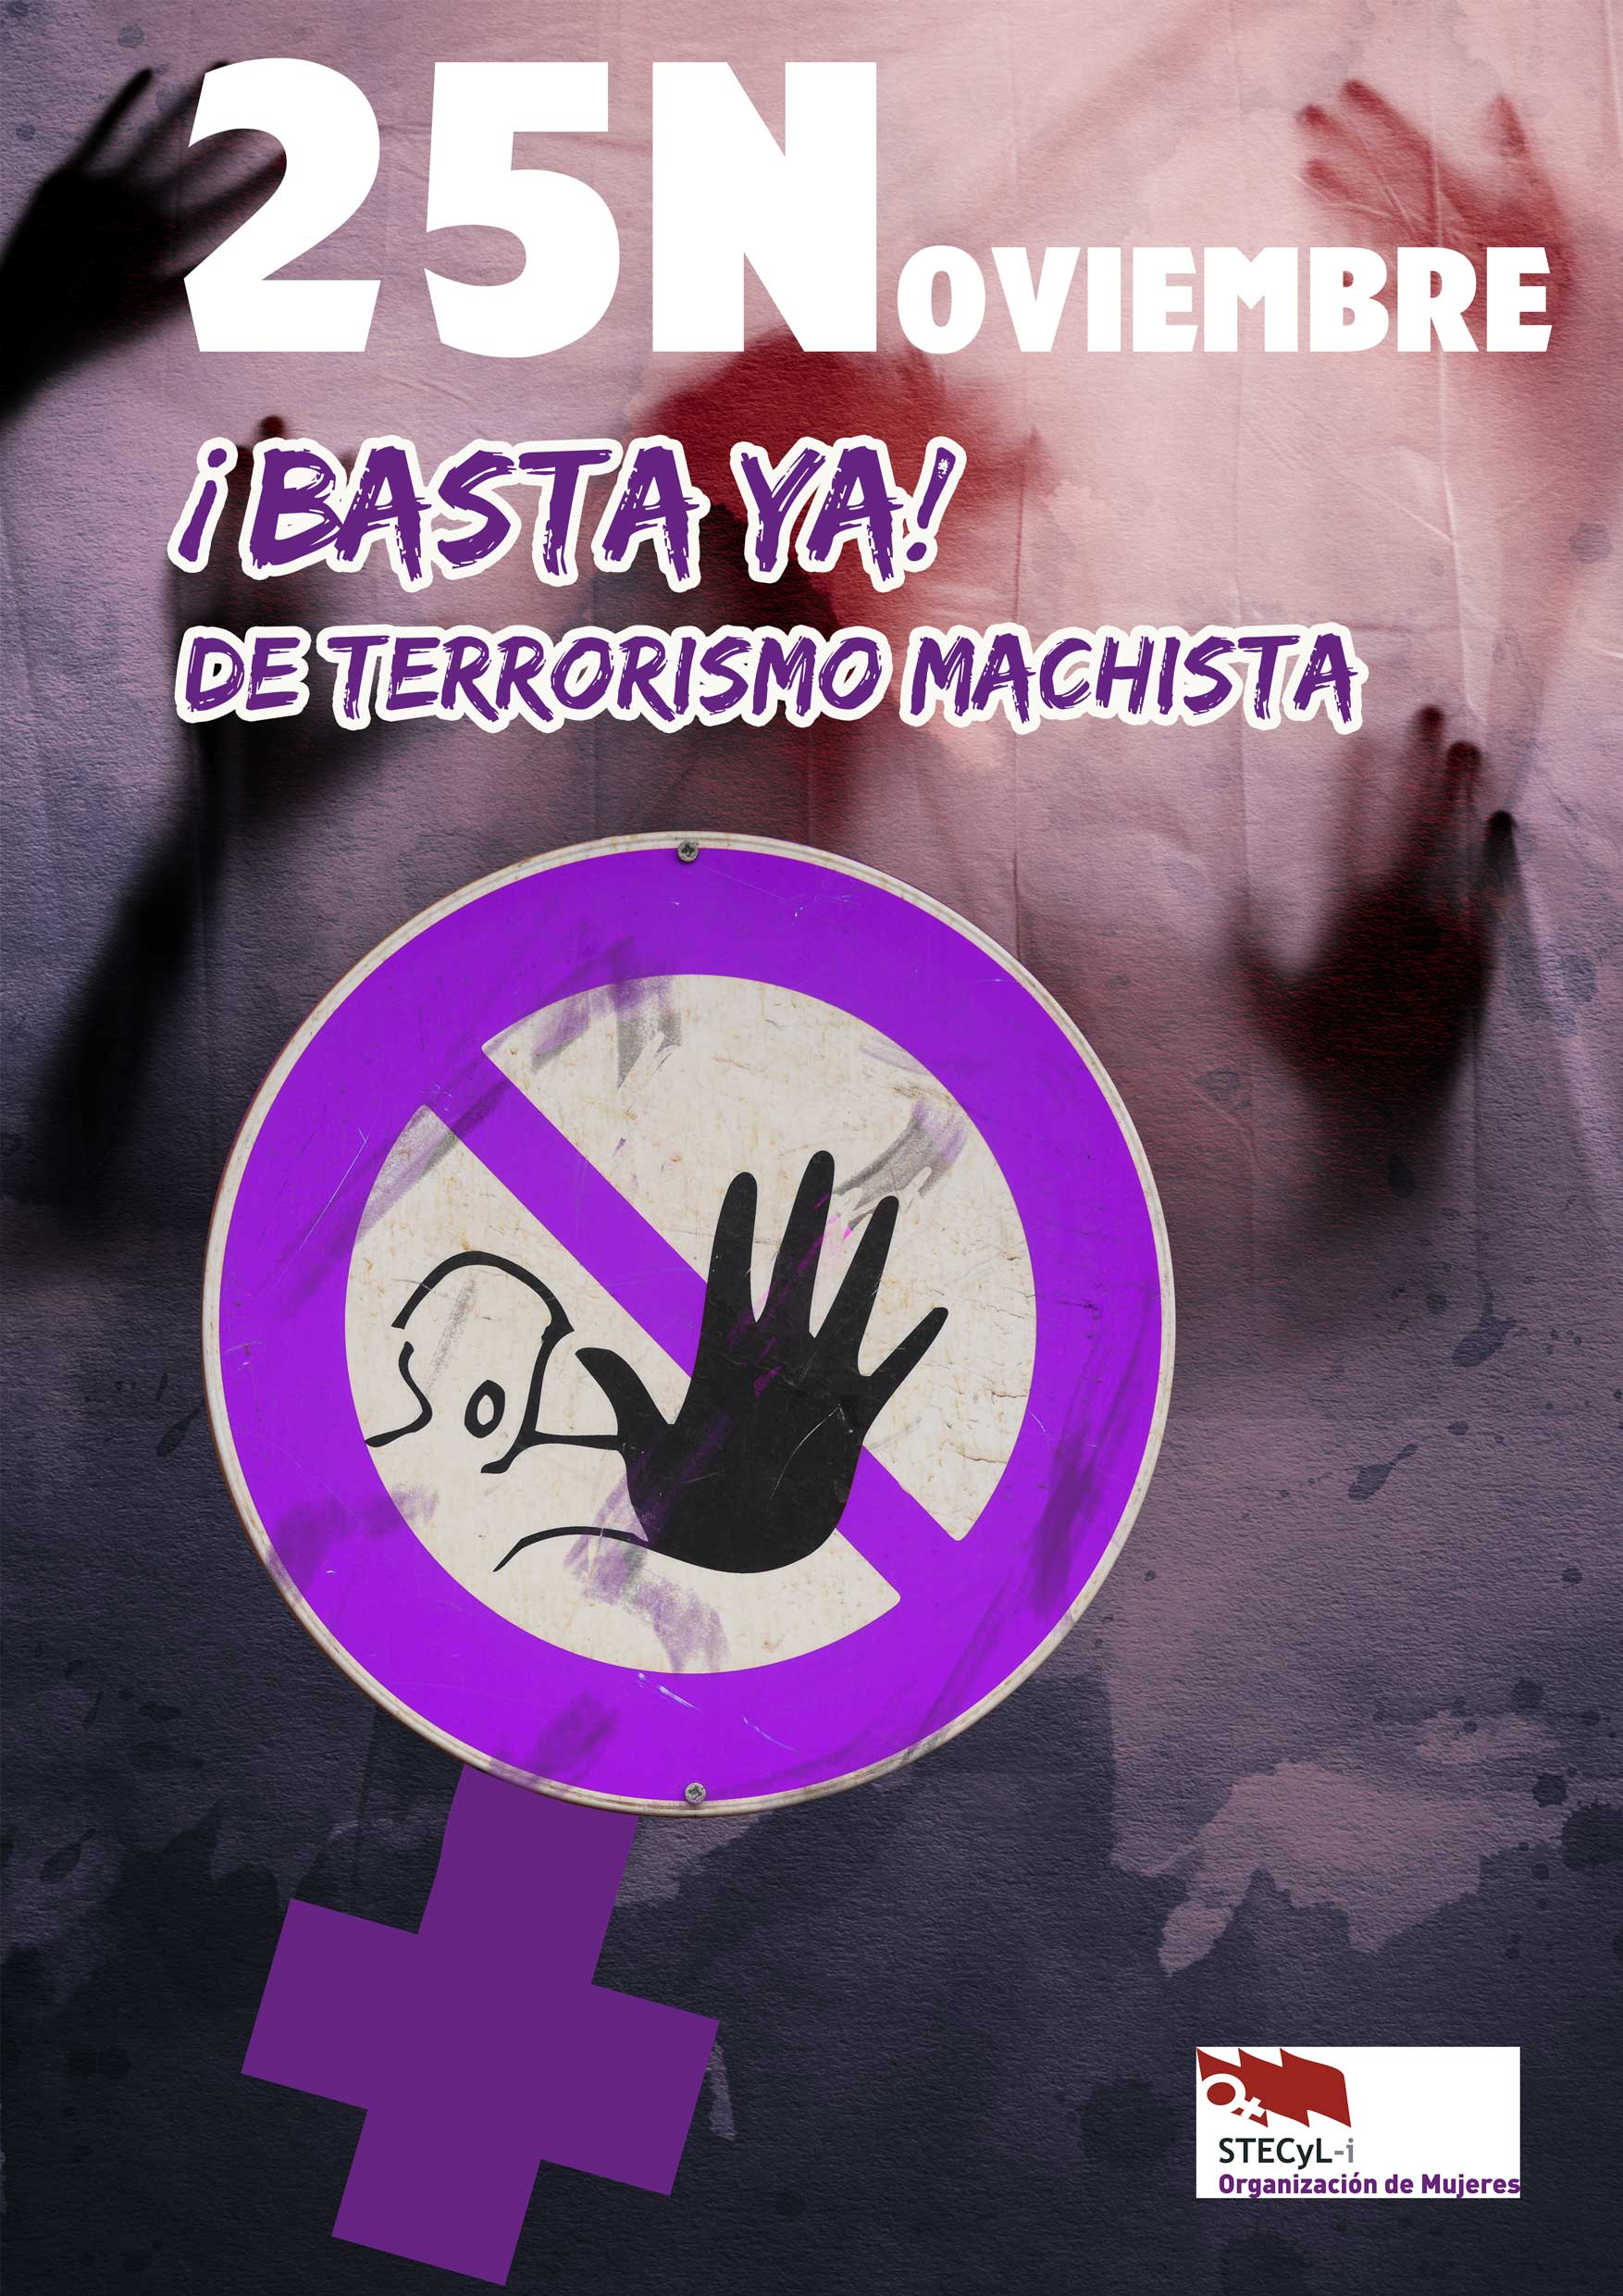 25Noviembre ¡Basta Ya! DE TERRORISMO MACHISTA